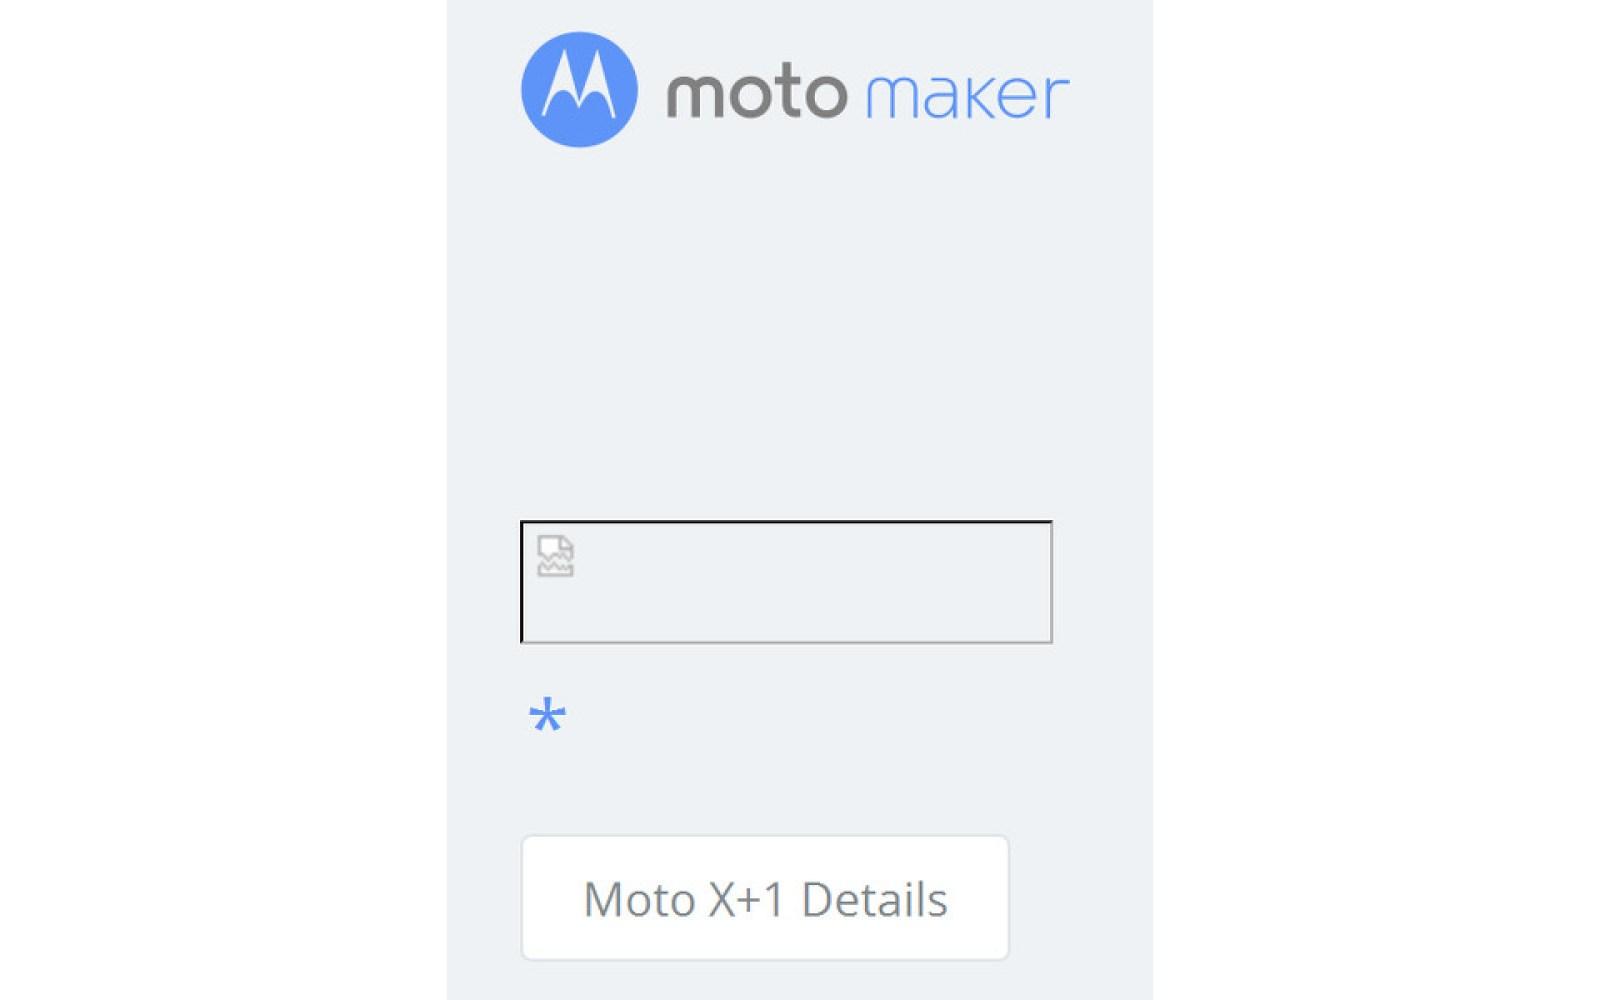 Moto X+1 spotted in Motorola's MotoMaker